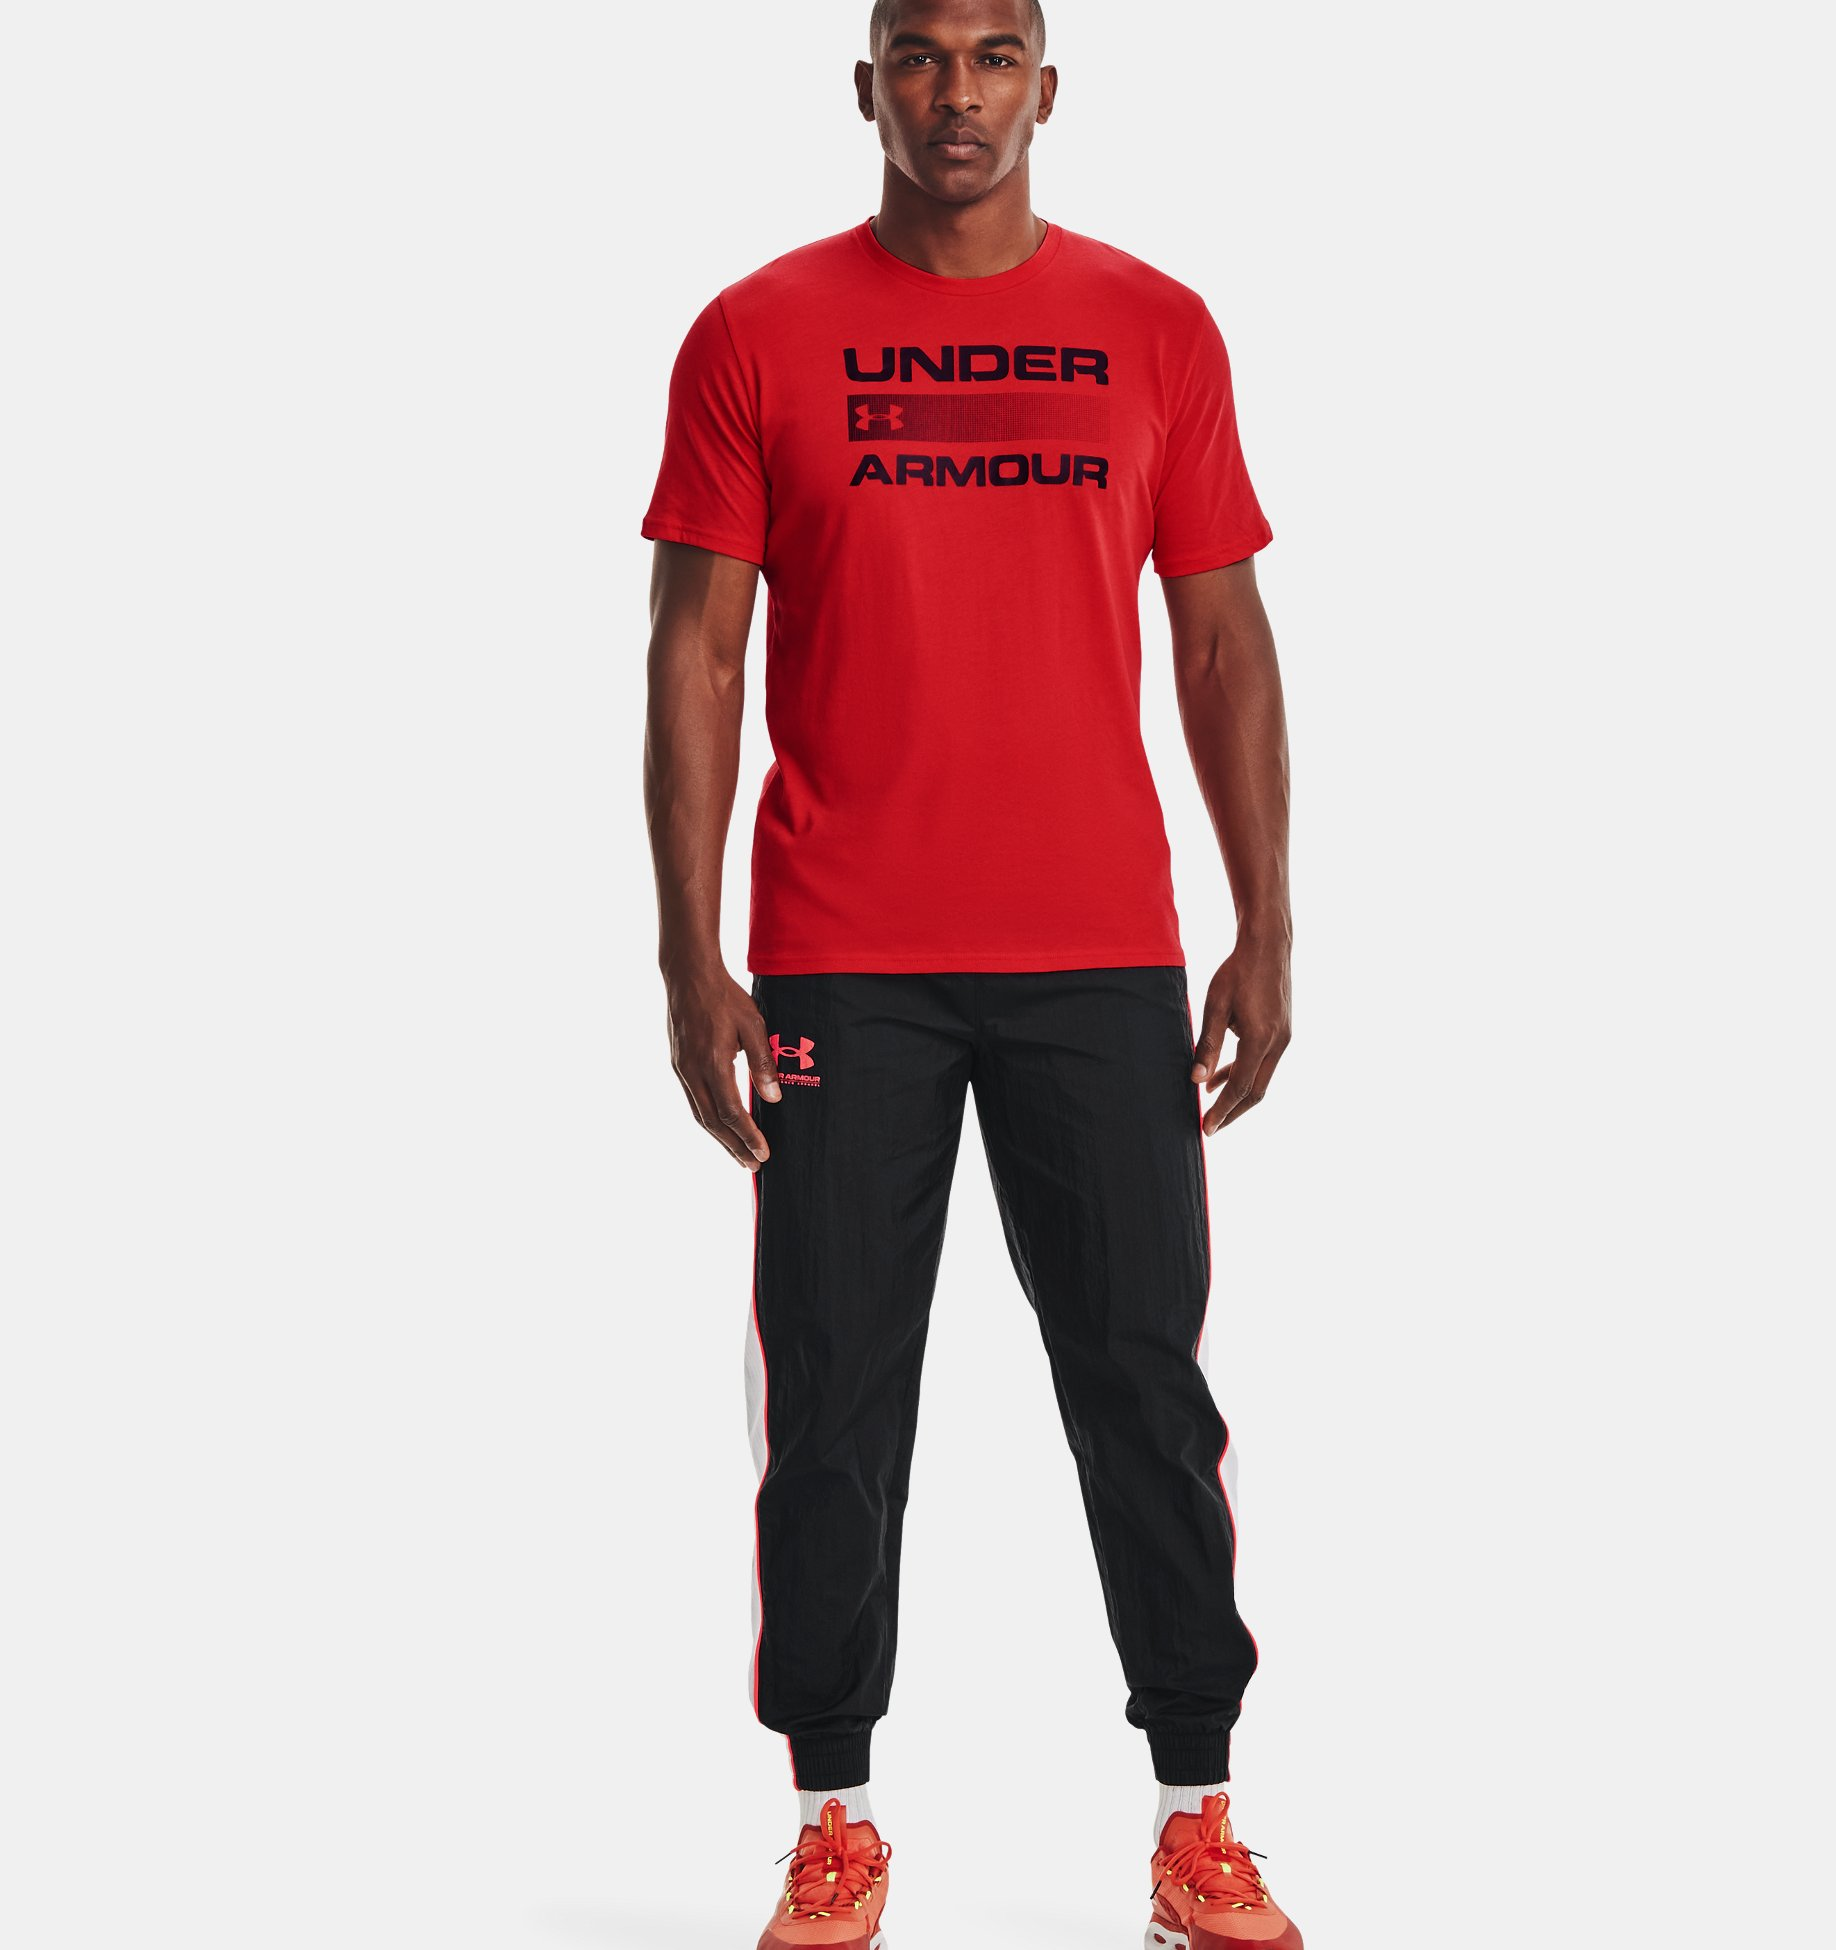 Underarmour Mens UA Team Issue Graphic T-Shirt